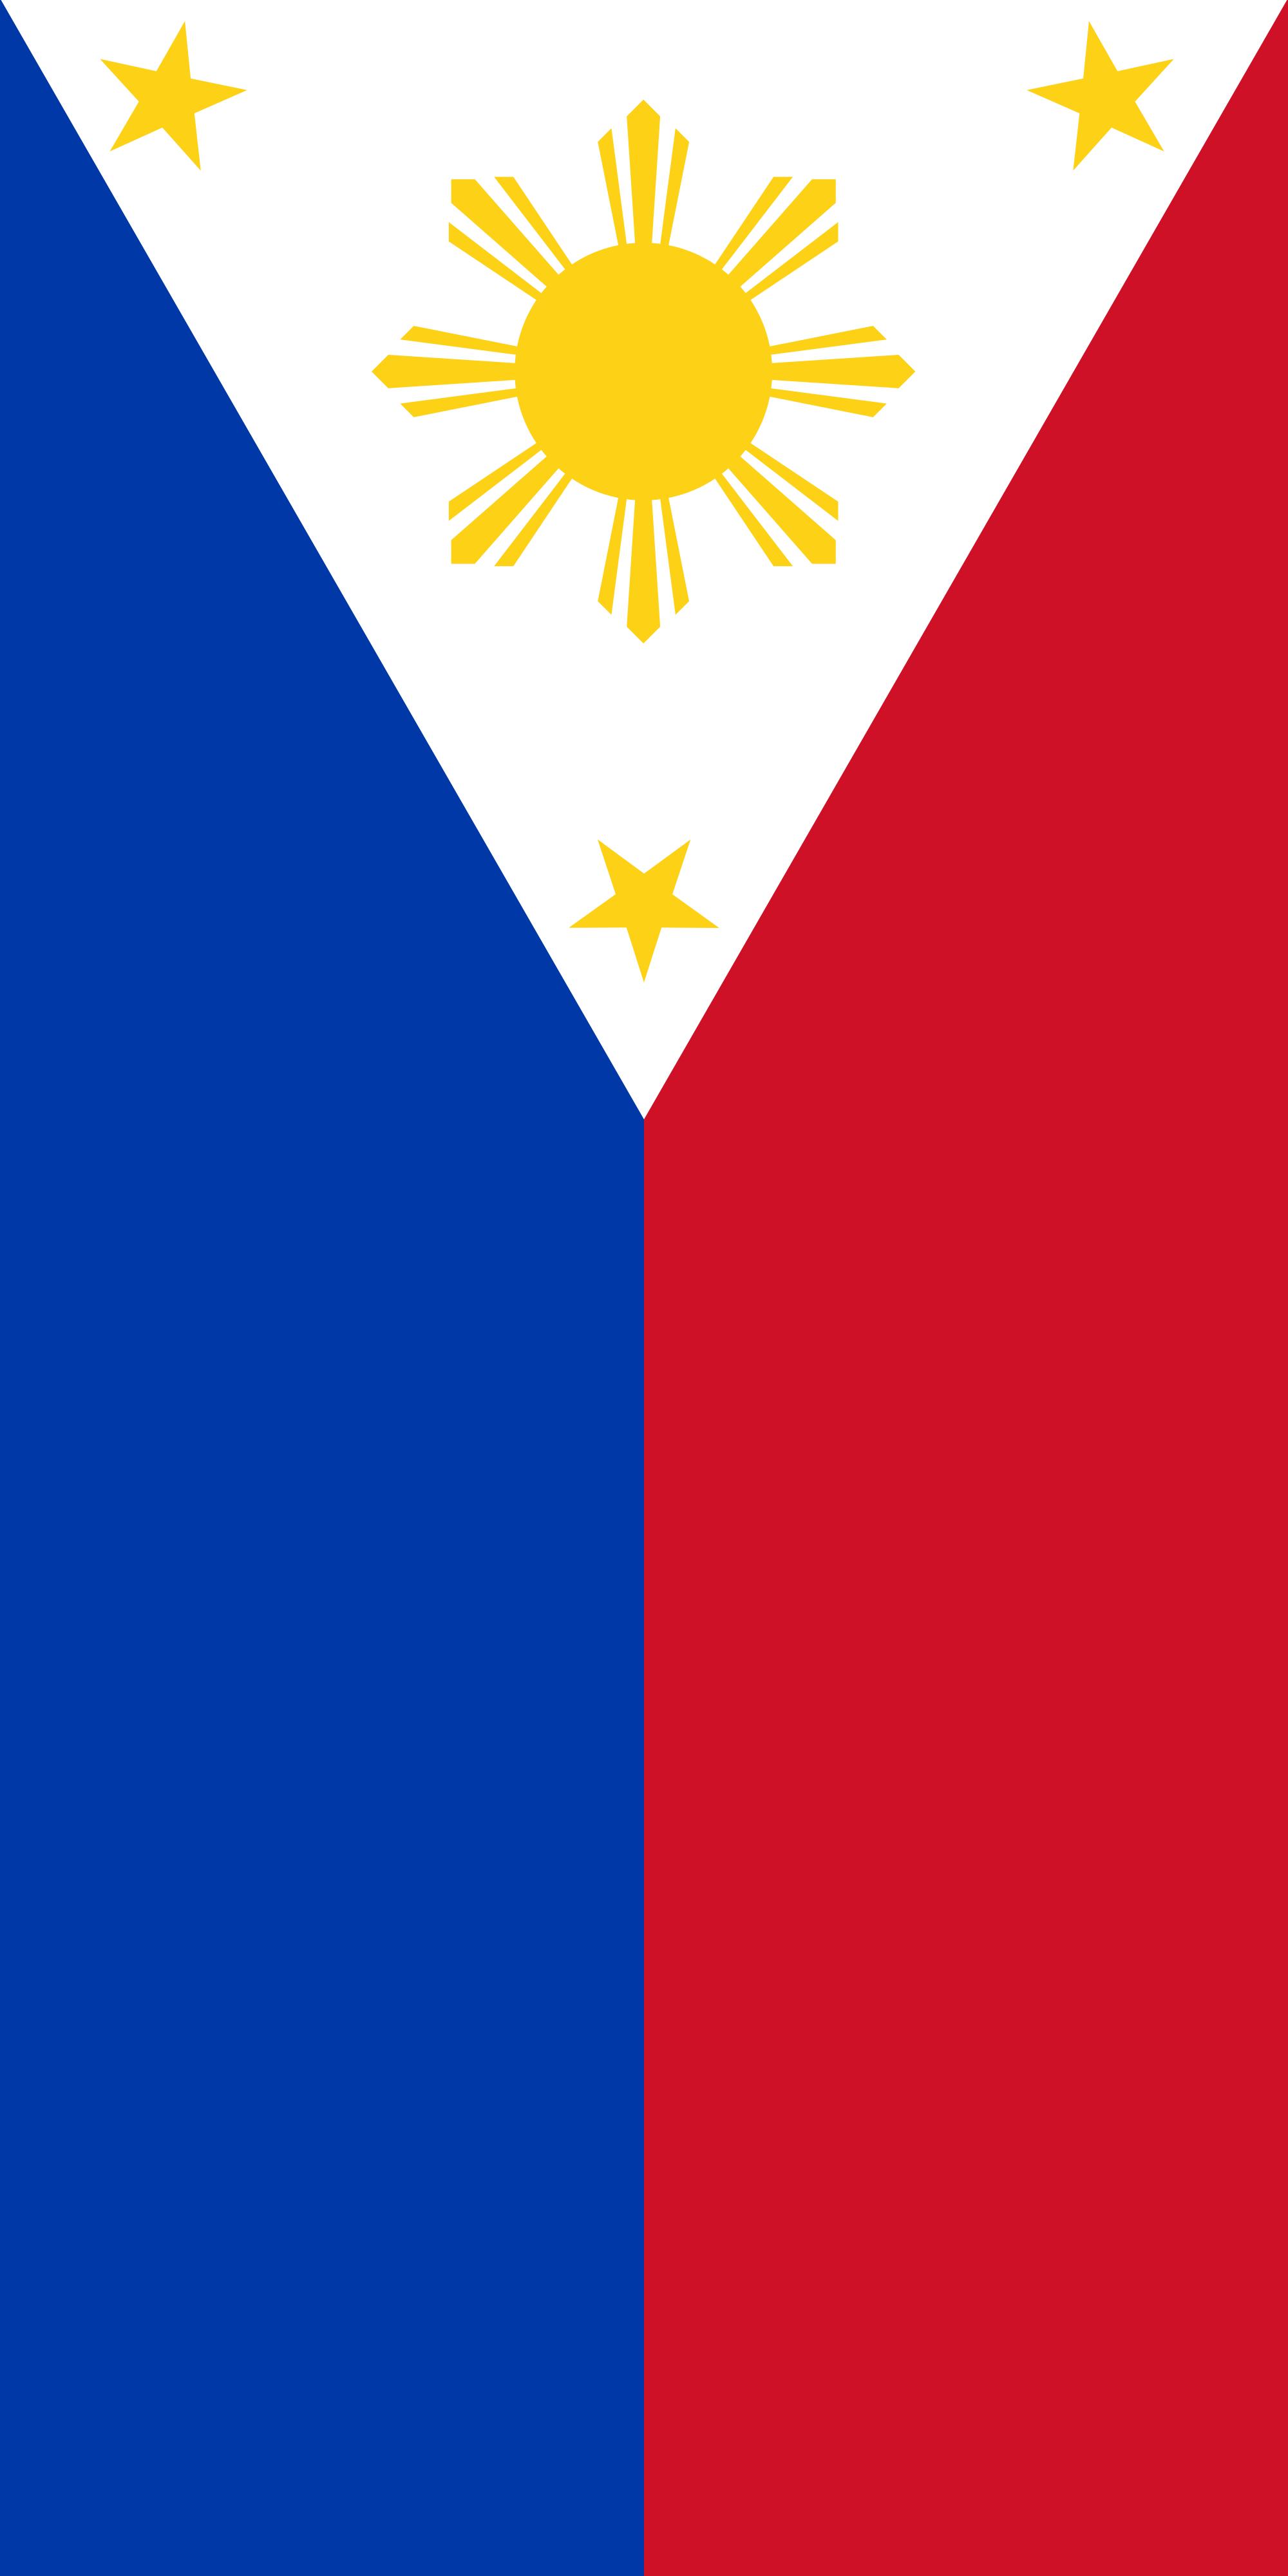 filipino flag google search perde koop pinterest filipino